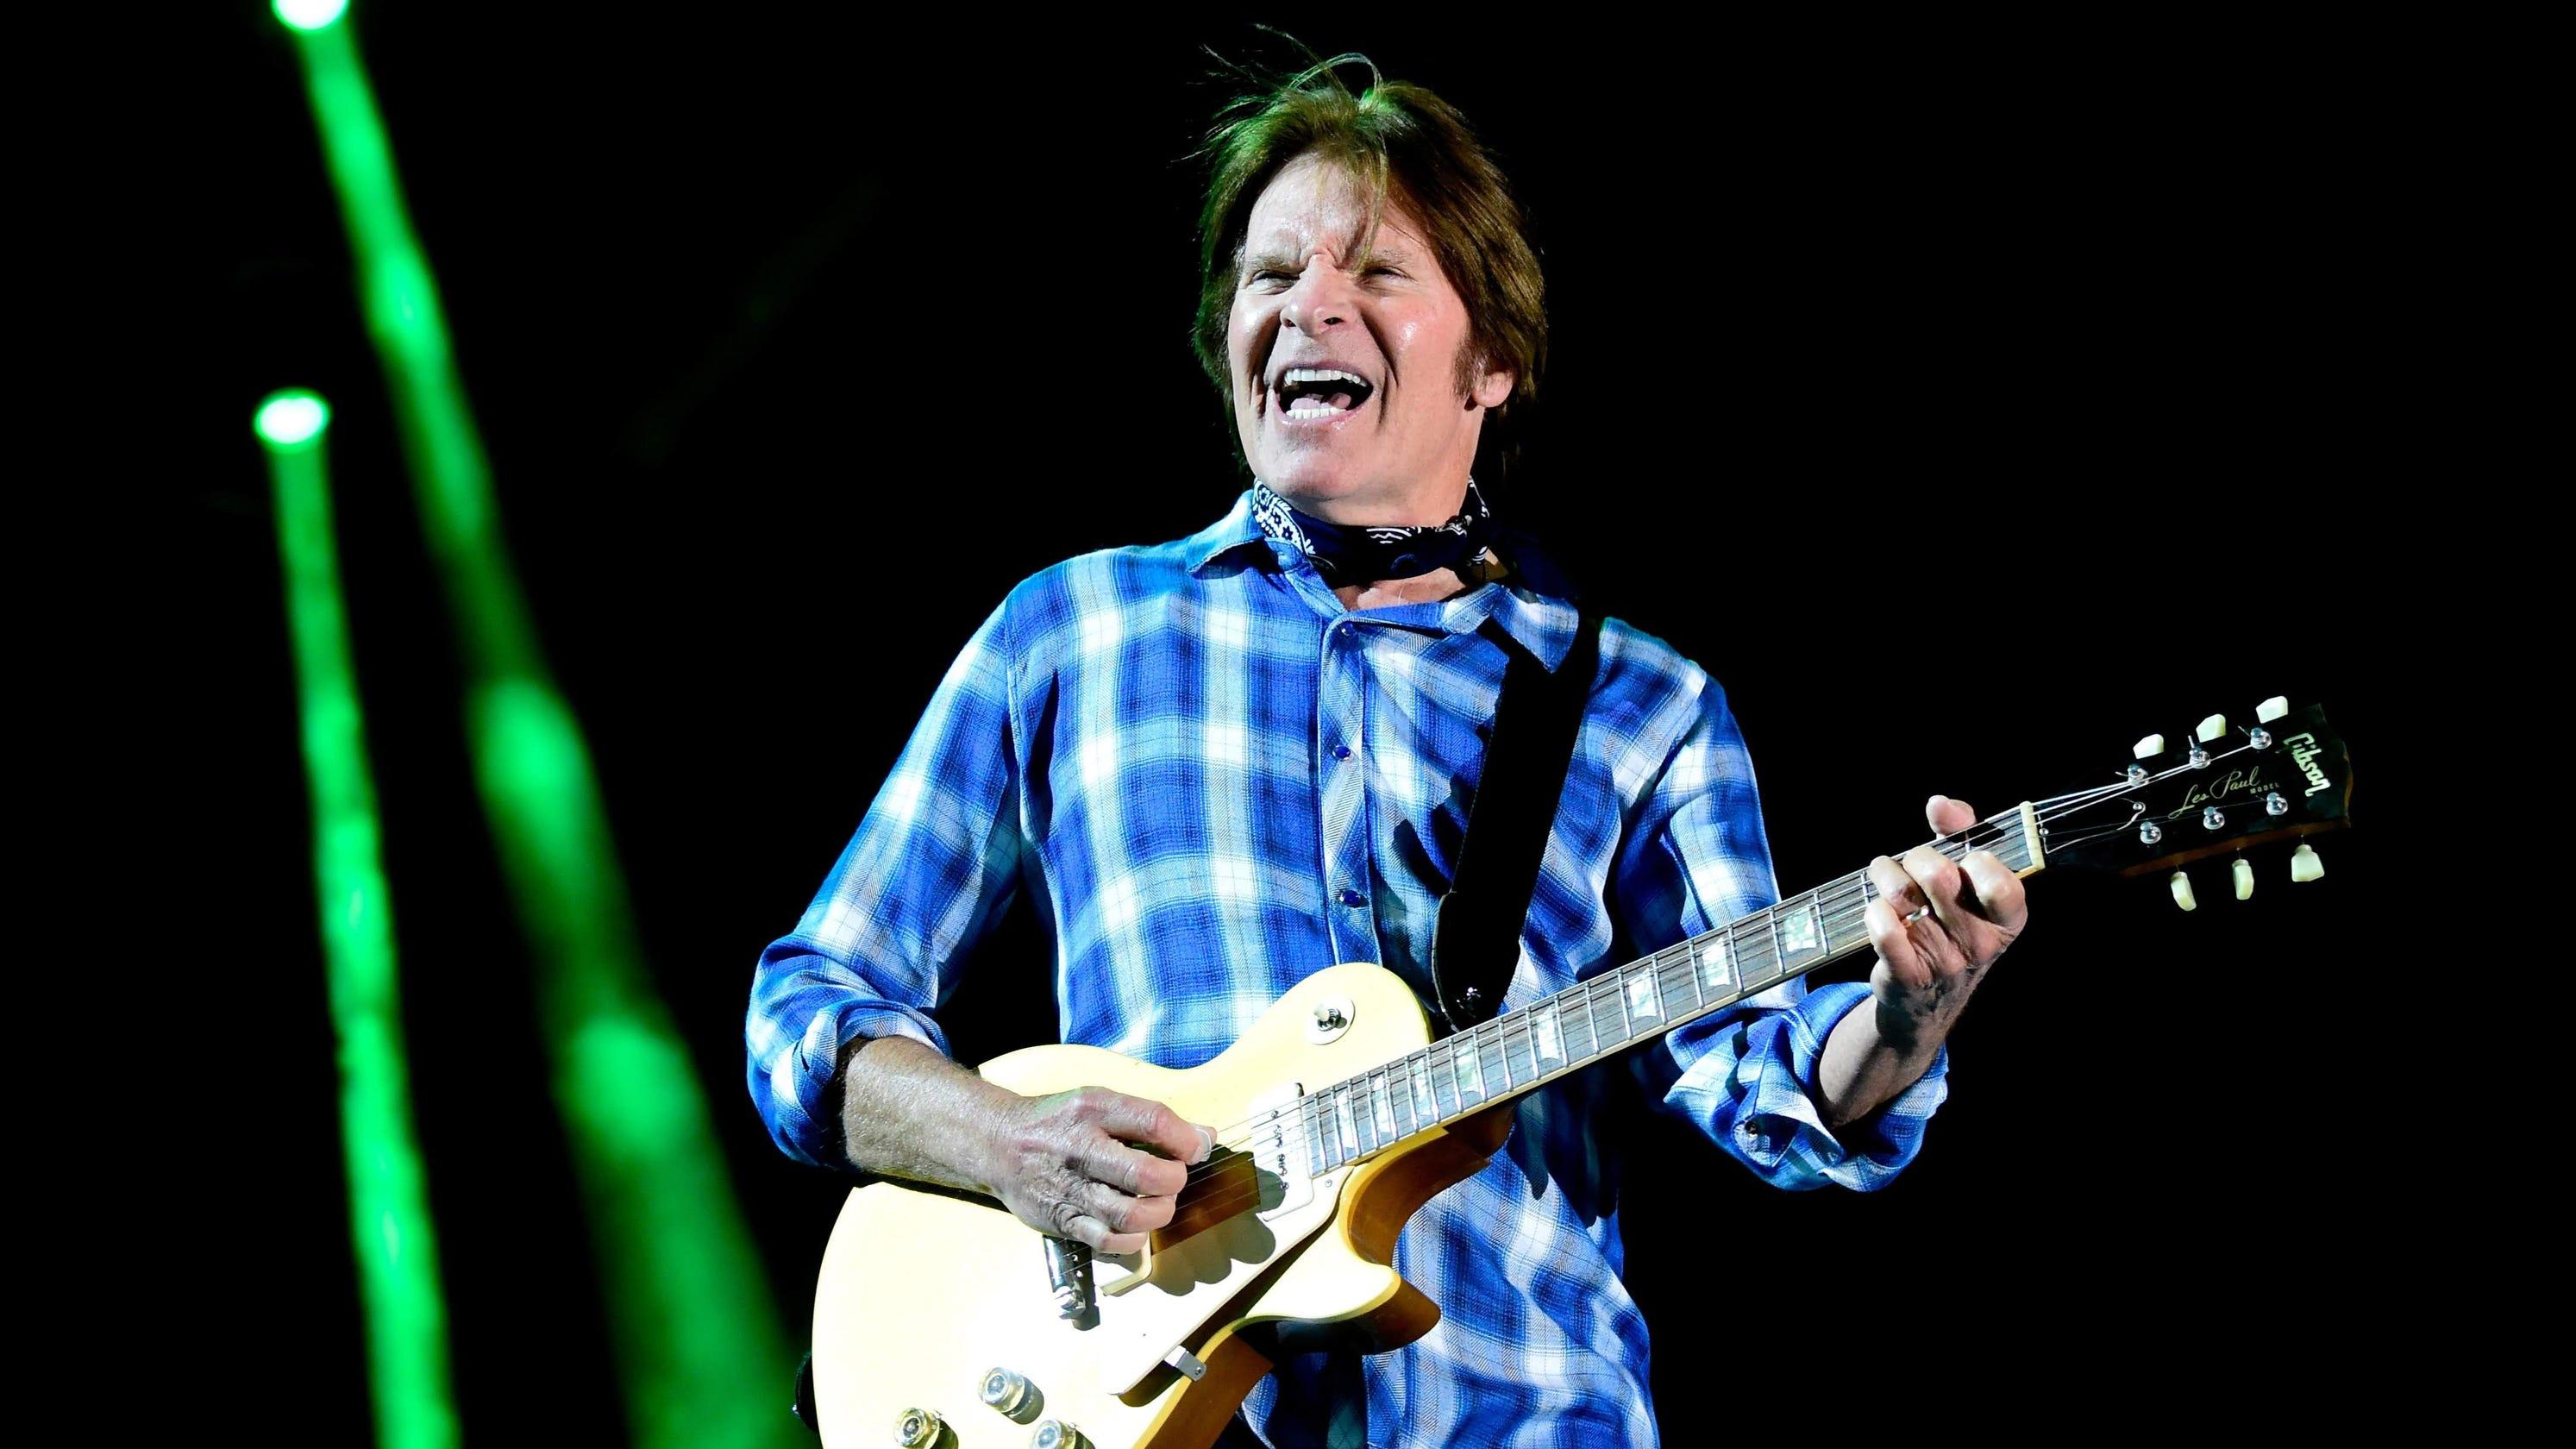 Bethel Woods: John Fogerty of Creedence to return to Woodstock site